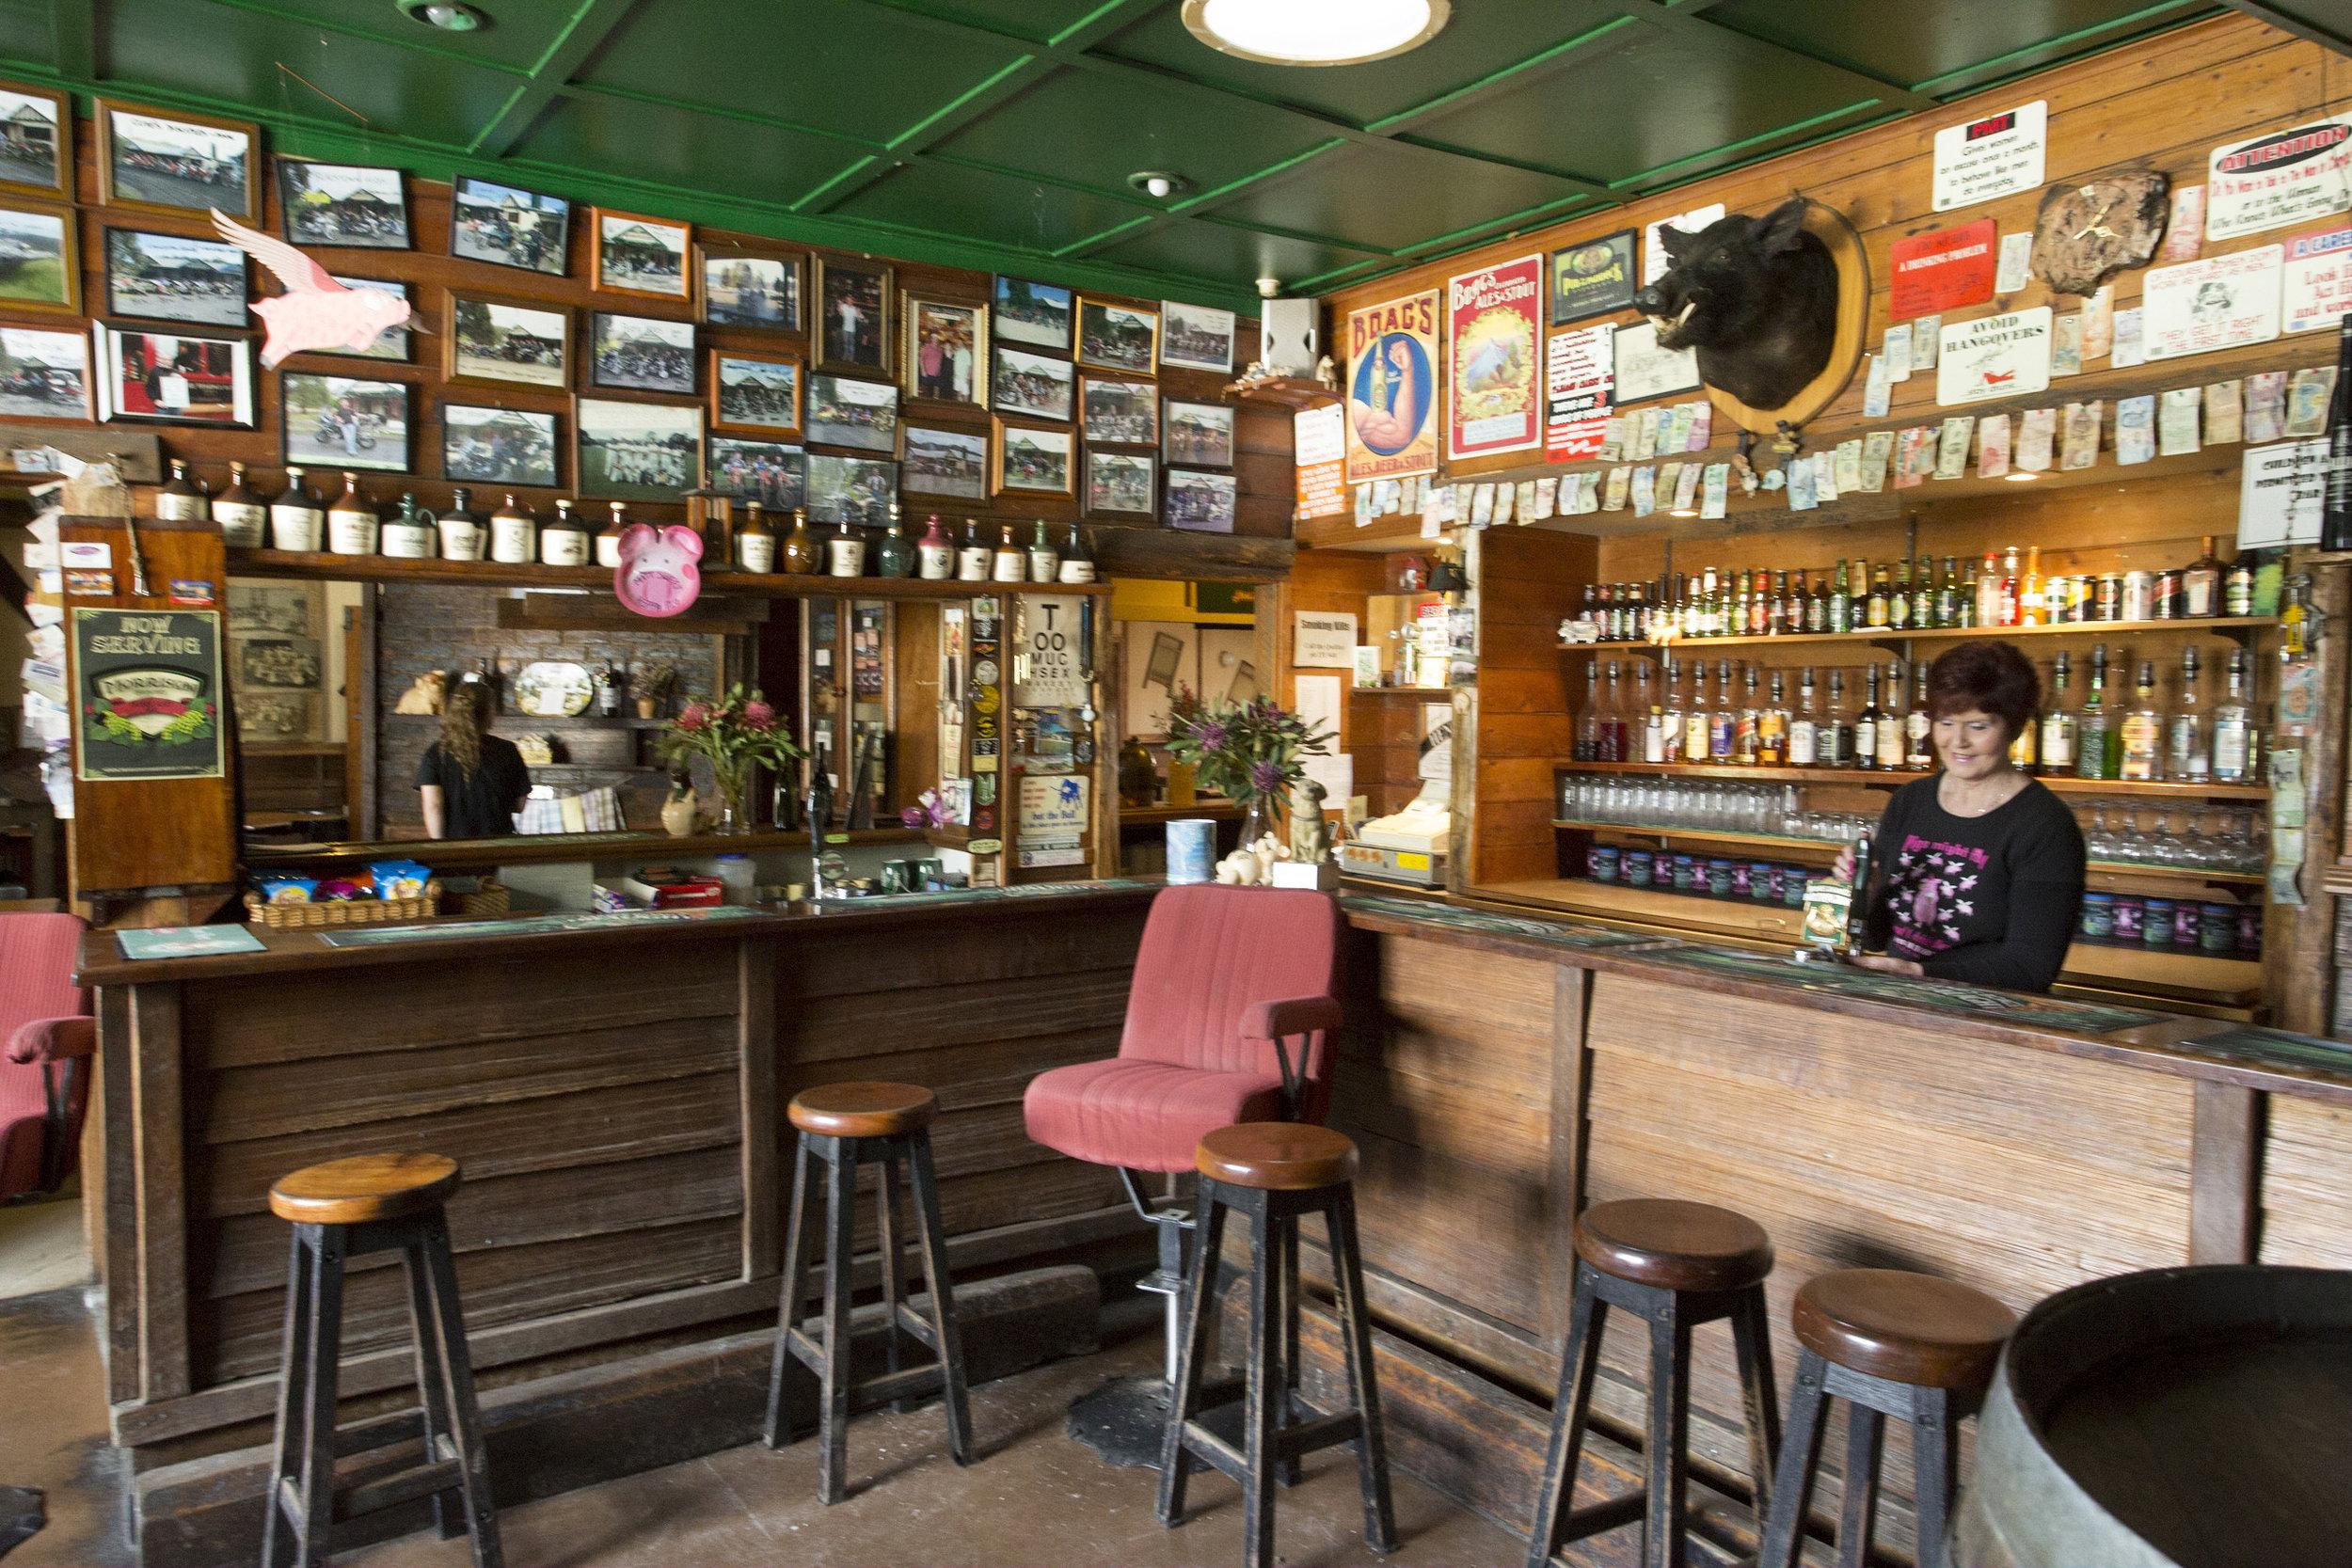 The Pub in the Paddock, one of Tasmania's oldest pubs, is on the East Coast of Tasmania